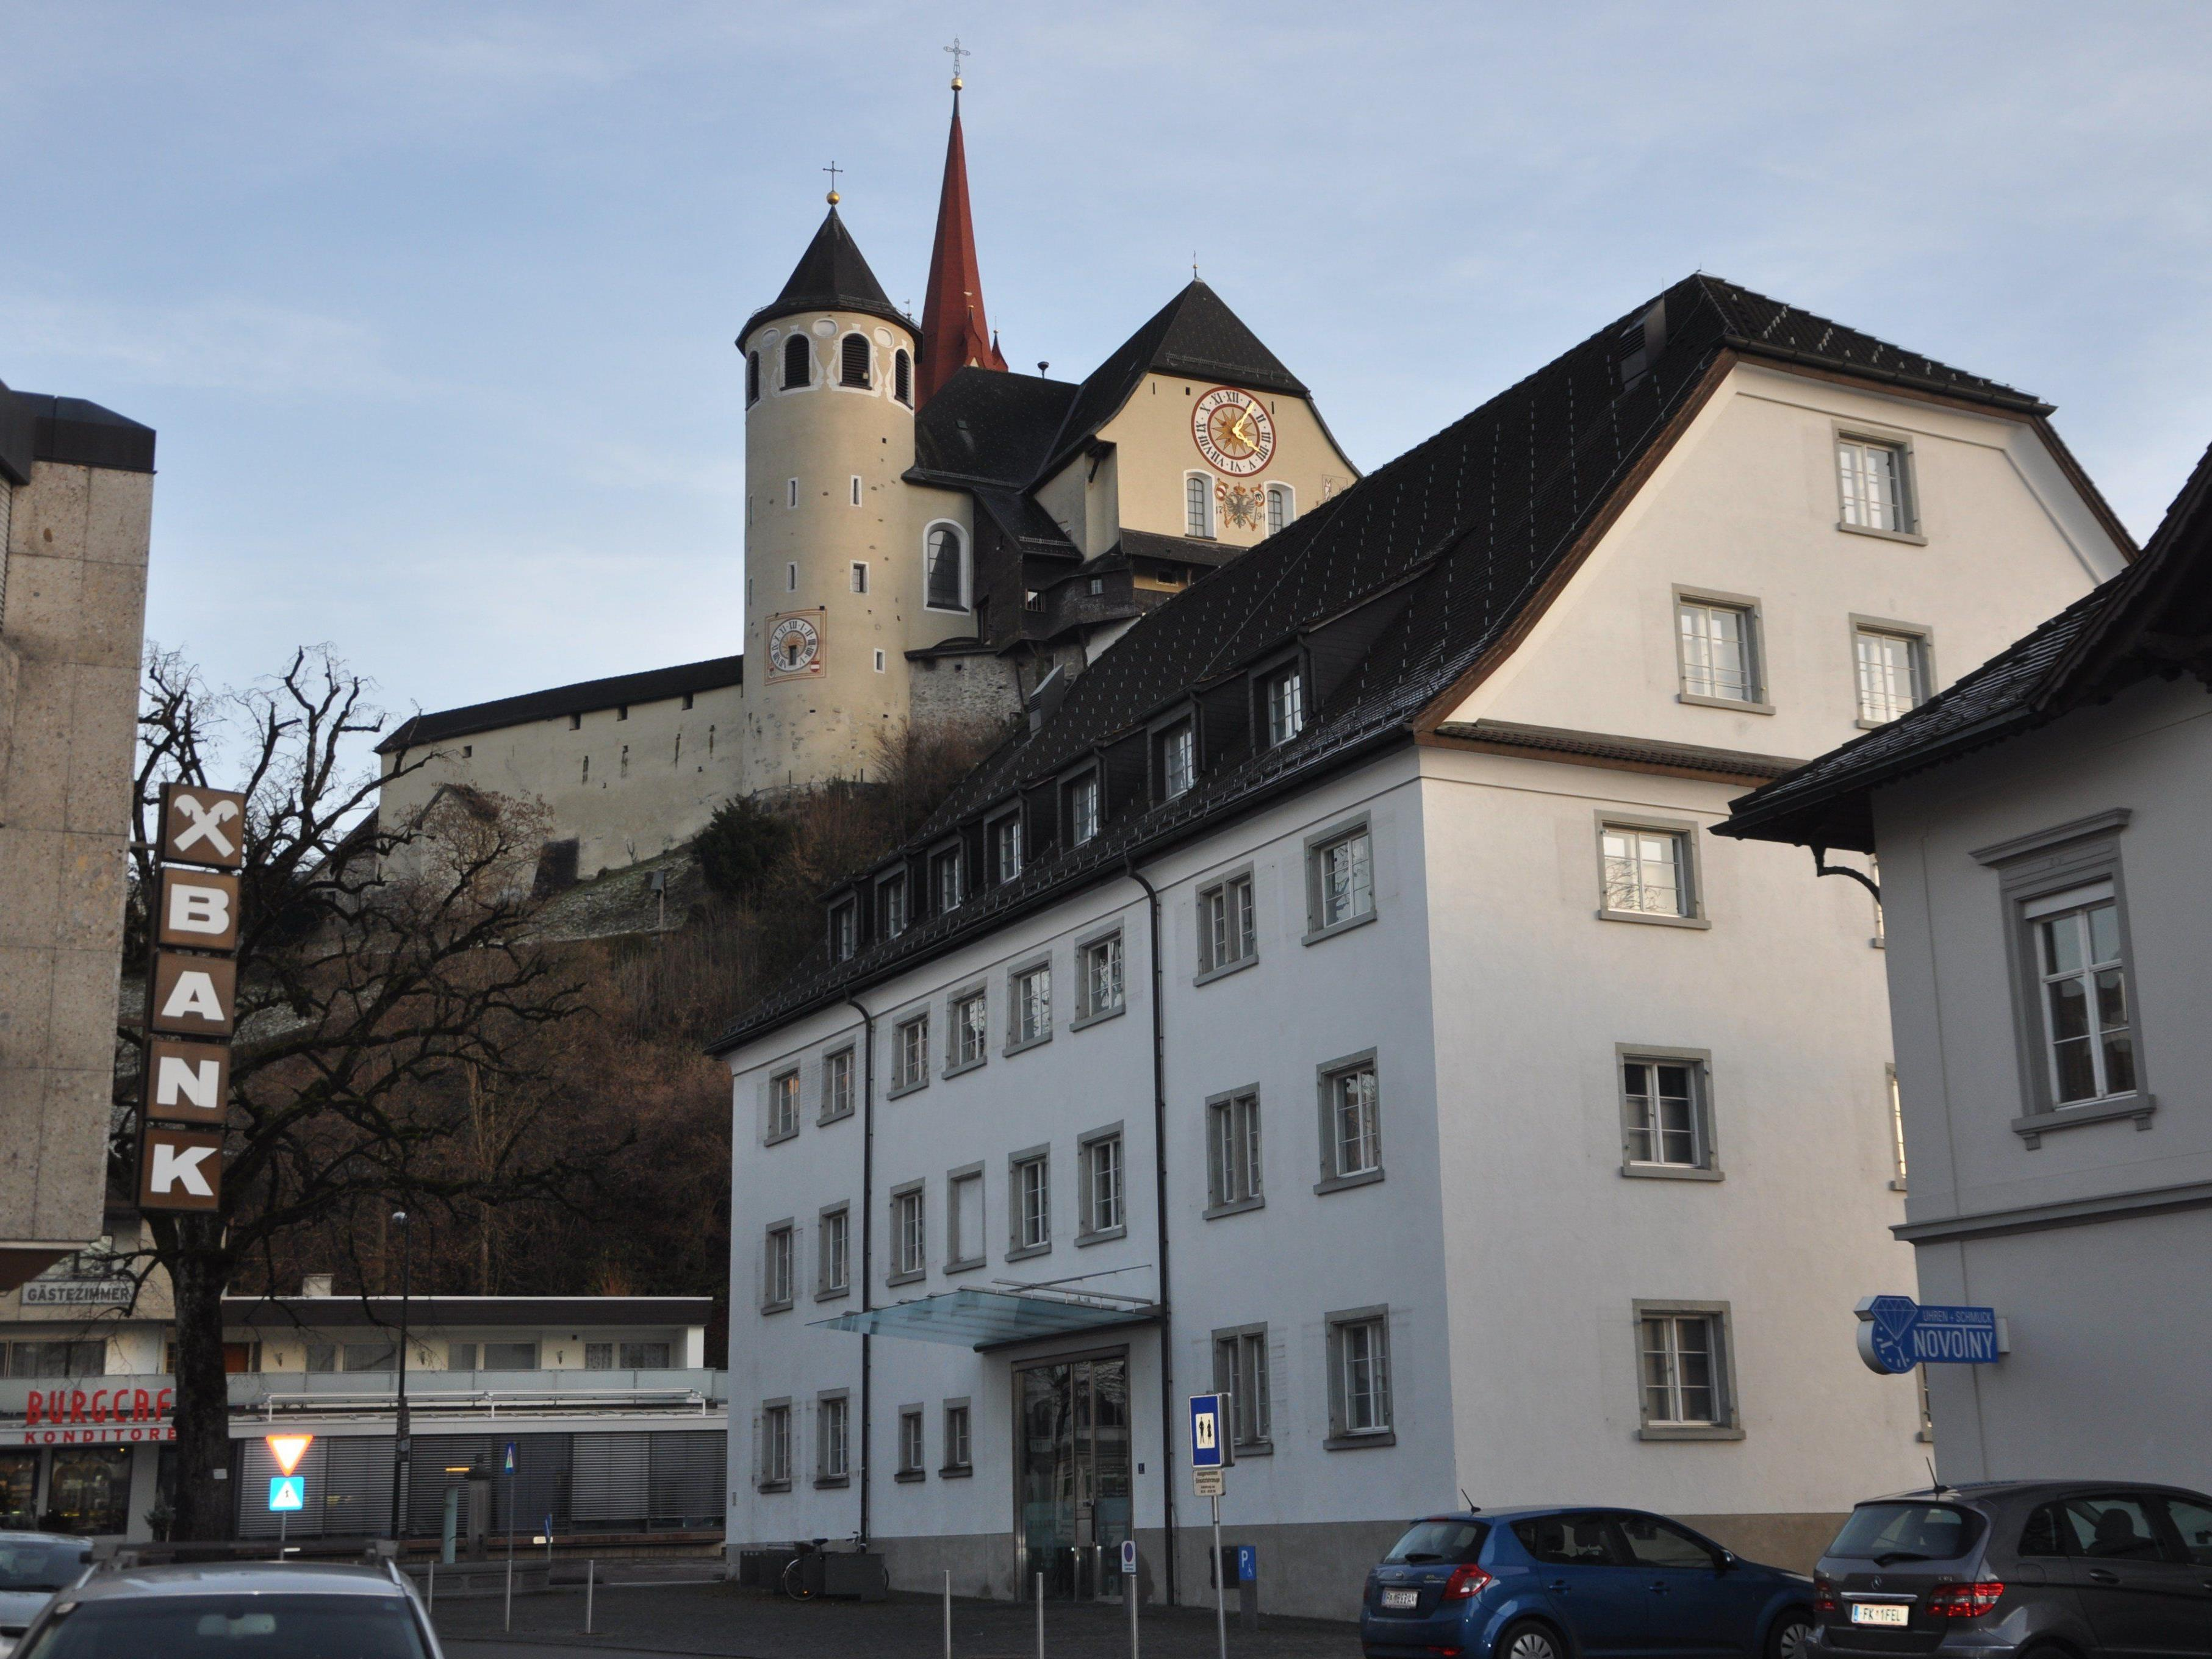 Das Rankweiler Rekord Budget wurde beschlossen.